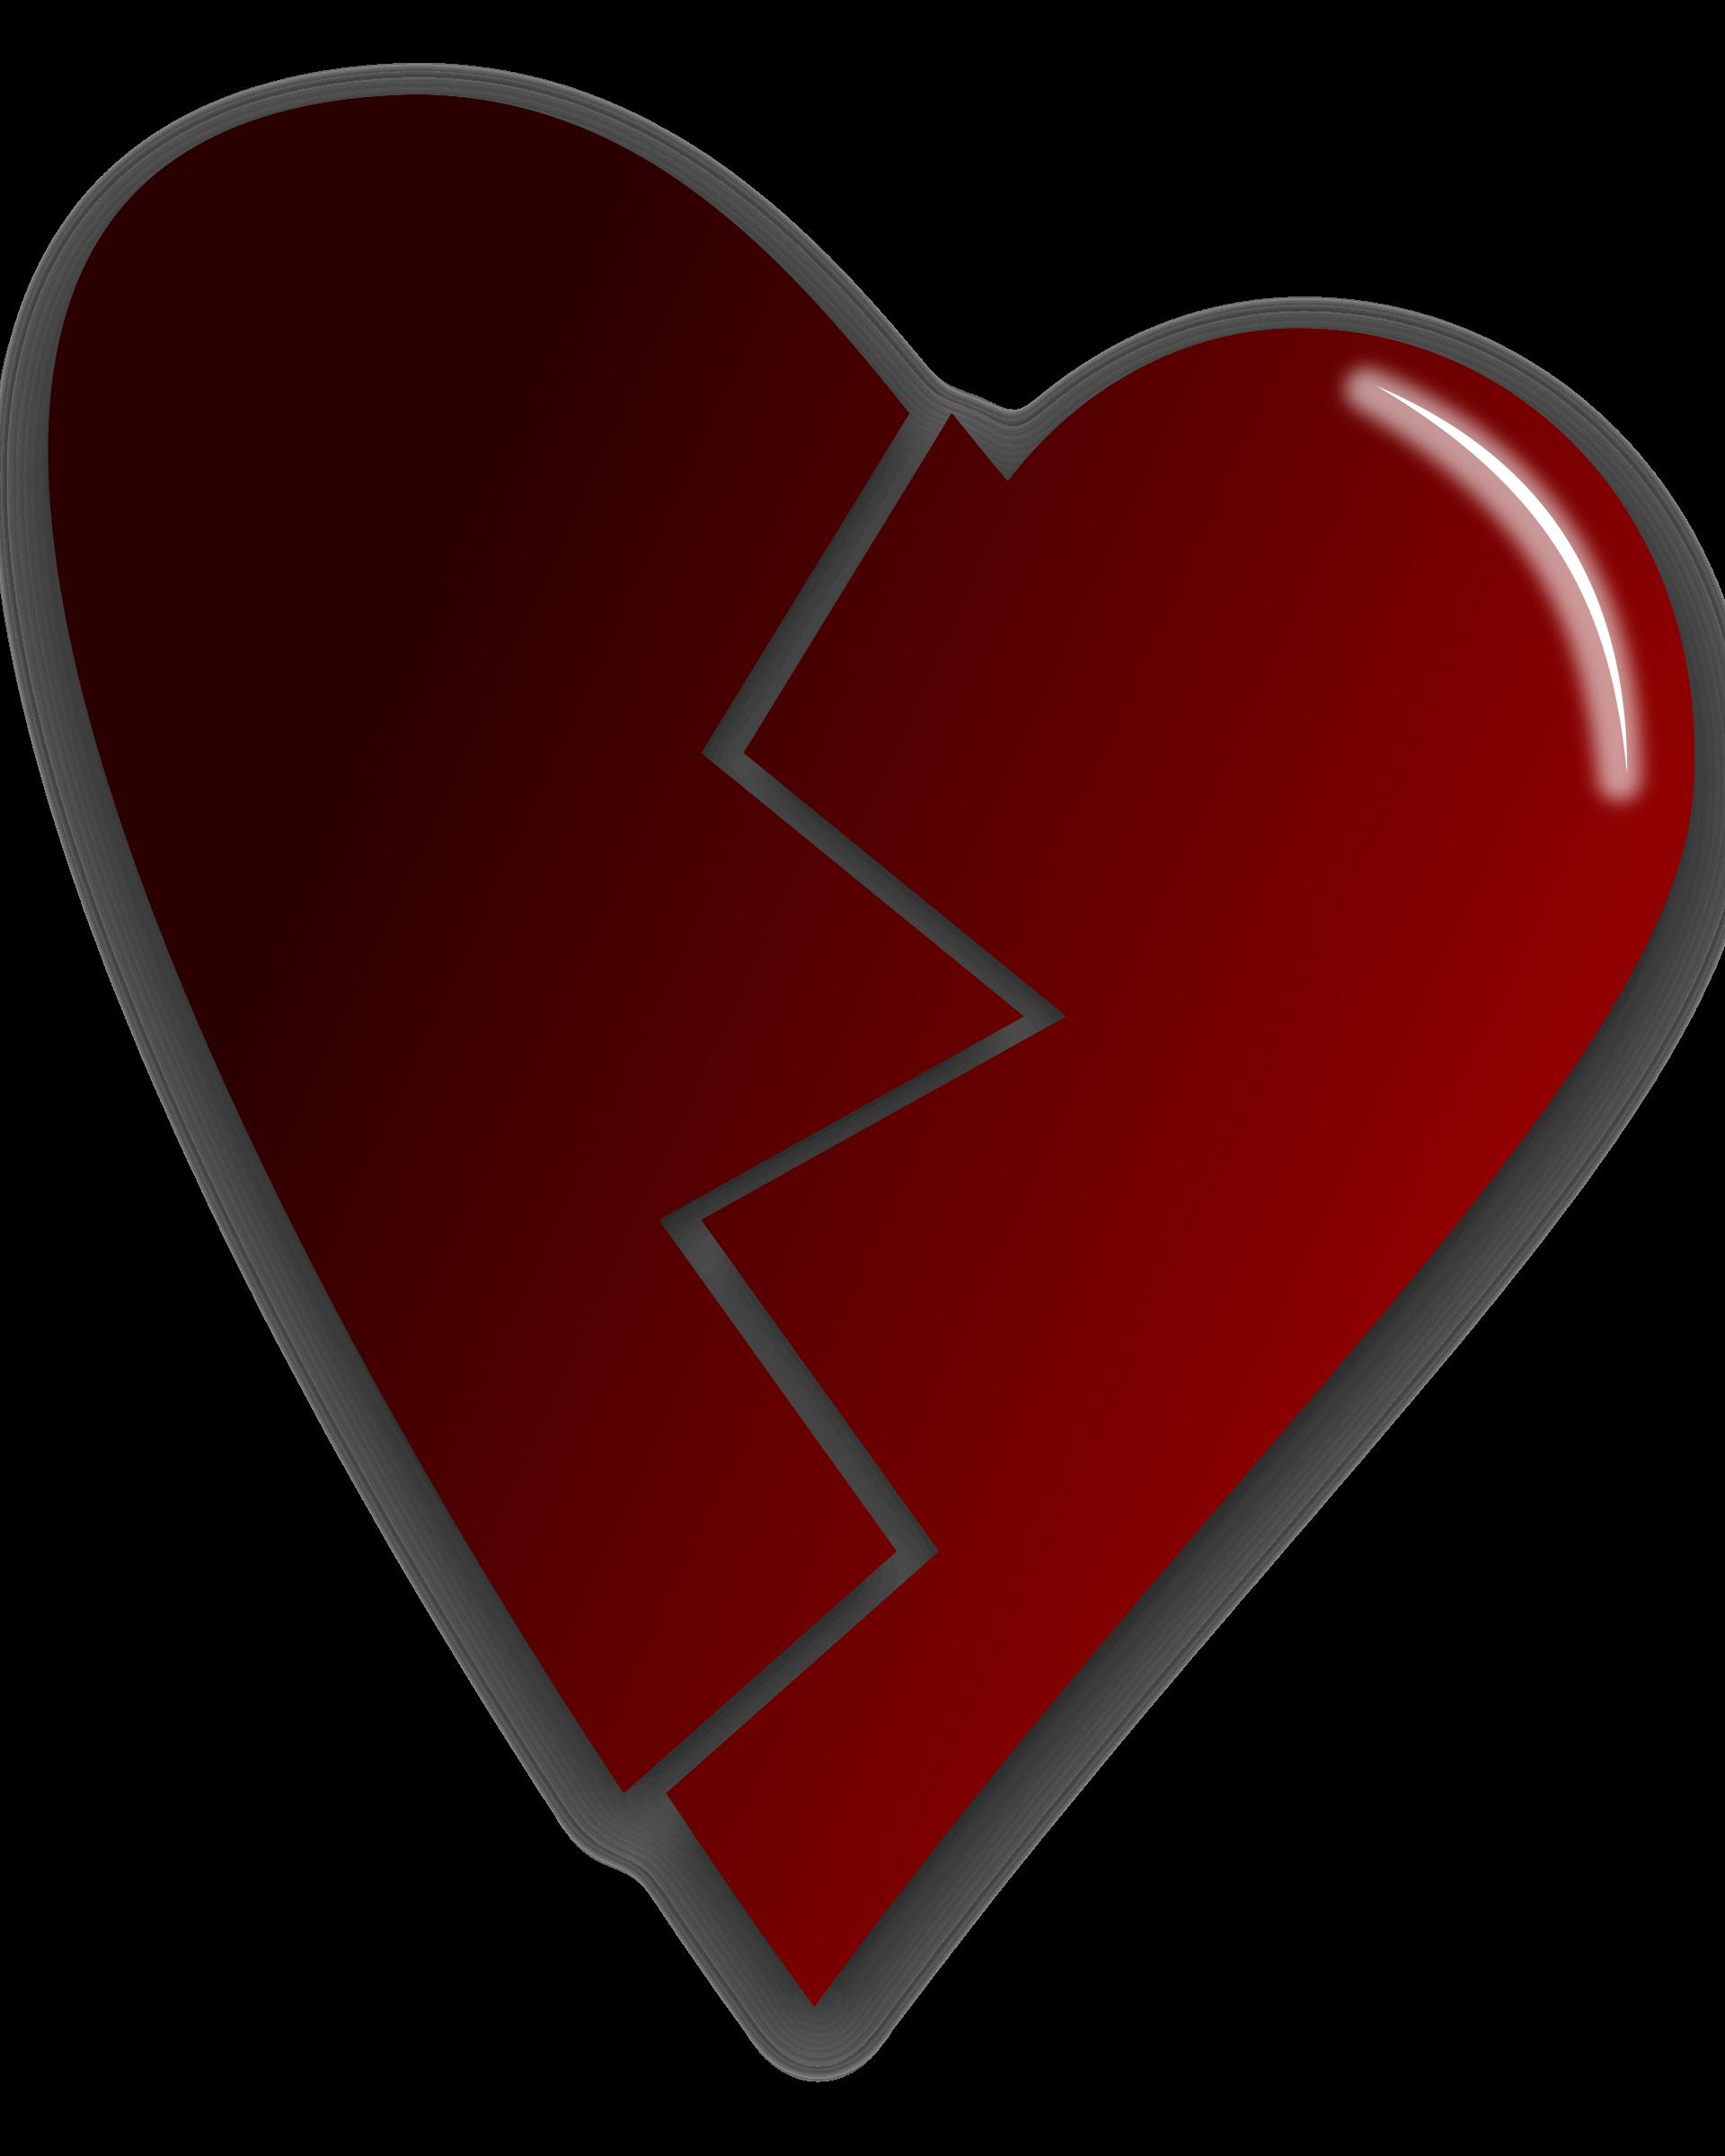 Broken heart clipart graphic free download Clipart - Broken heart graphic free download